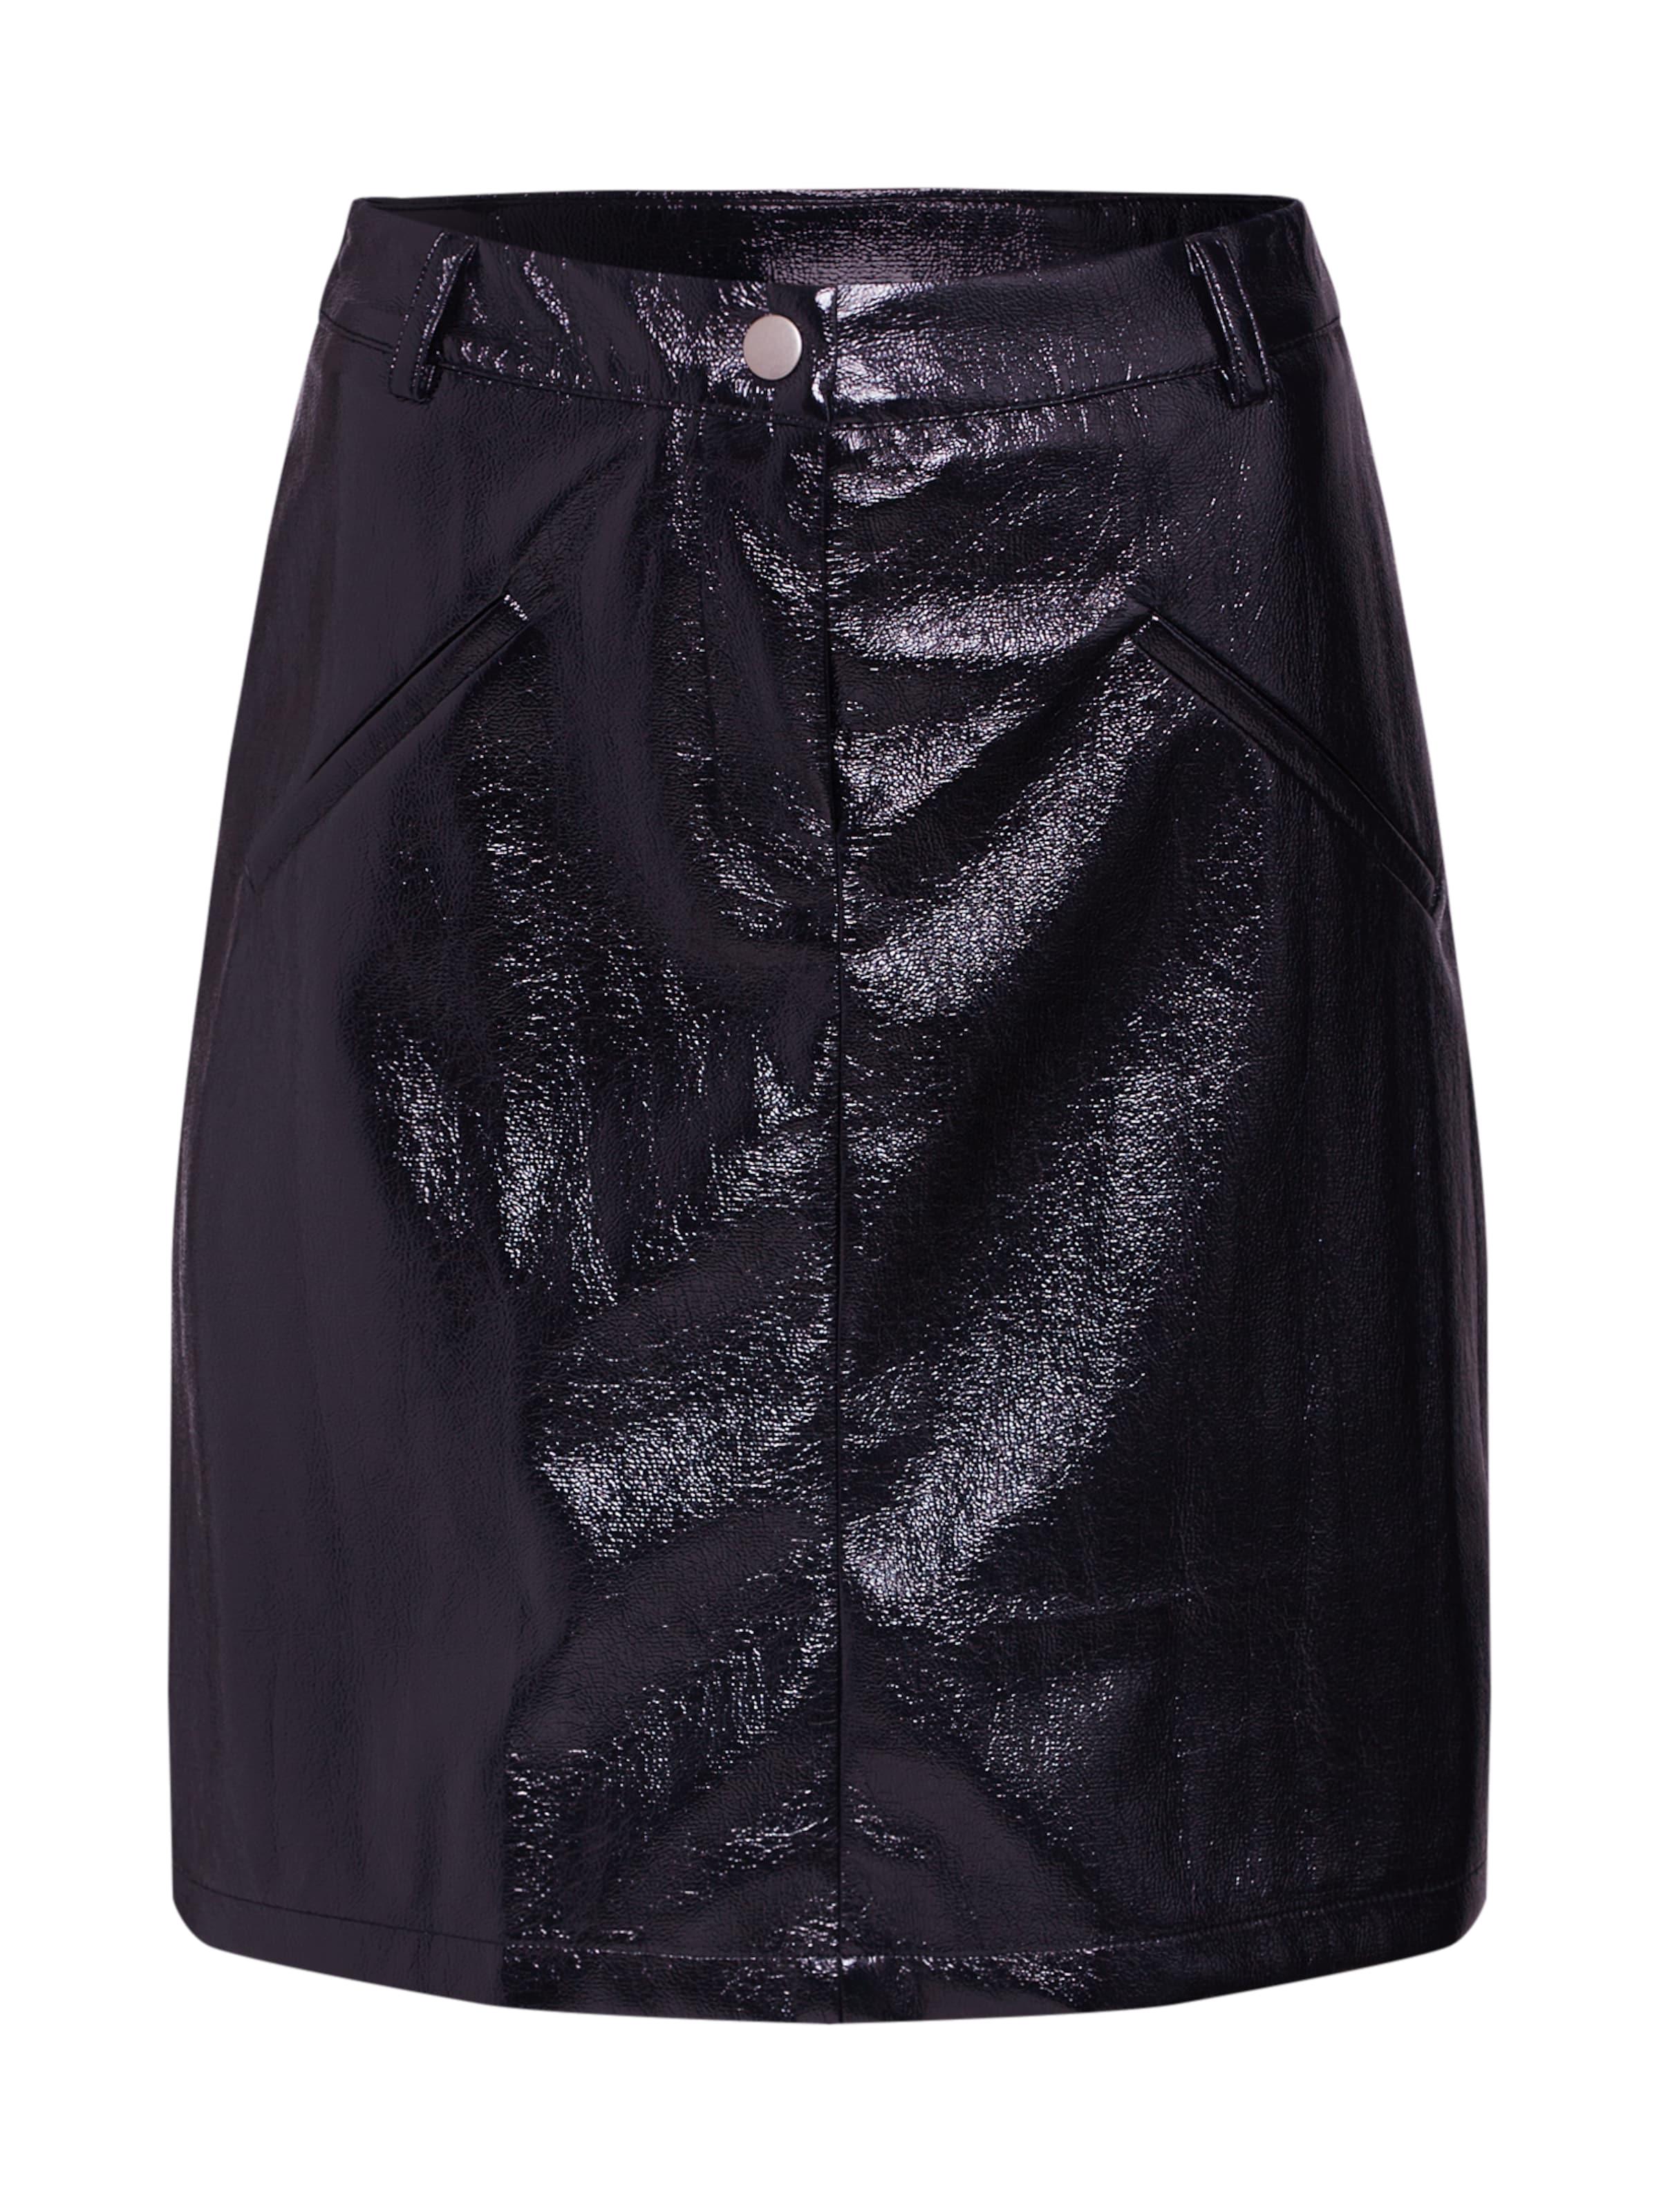 Textured Jupe 'patent Pu' Boohoo Noir En nNOPkw8ZX0